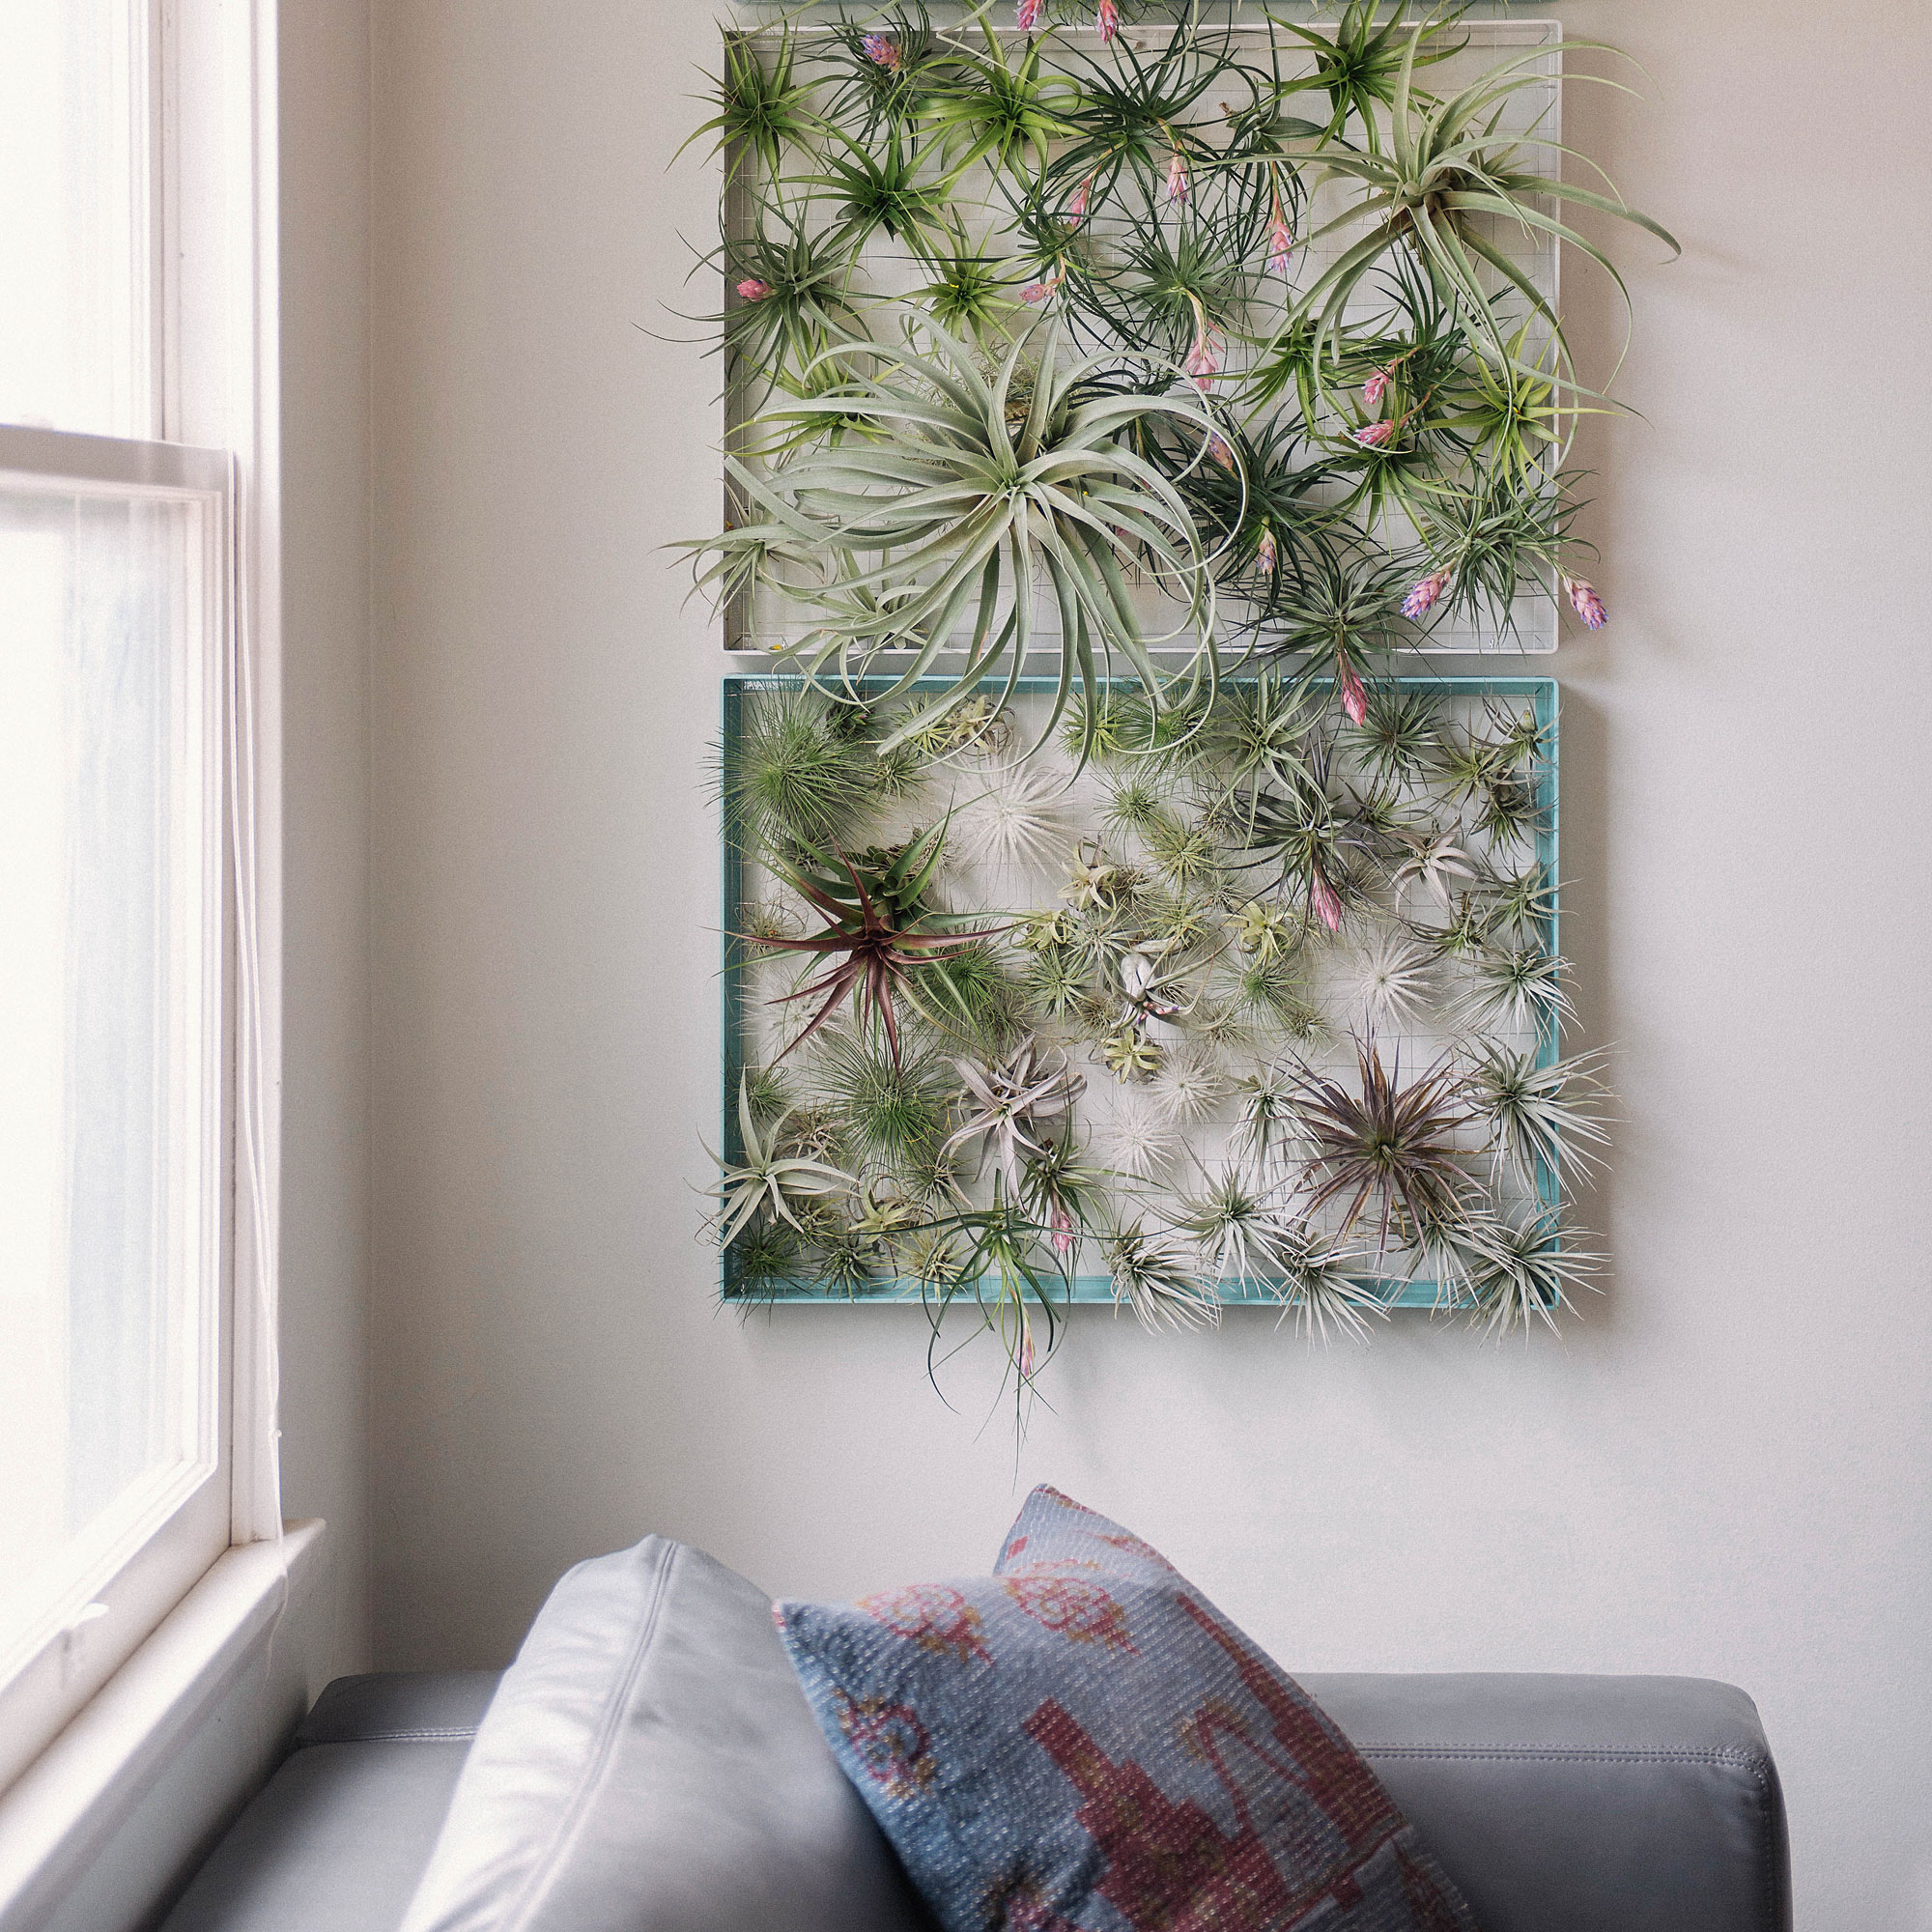 Decorating With Air Plants Sunset Sunset Magazine